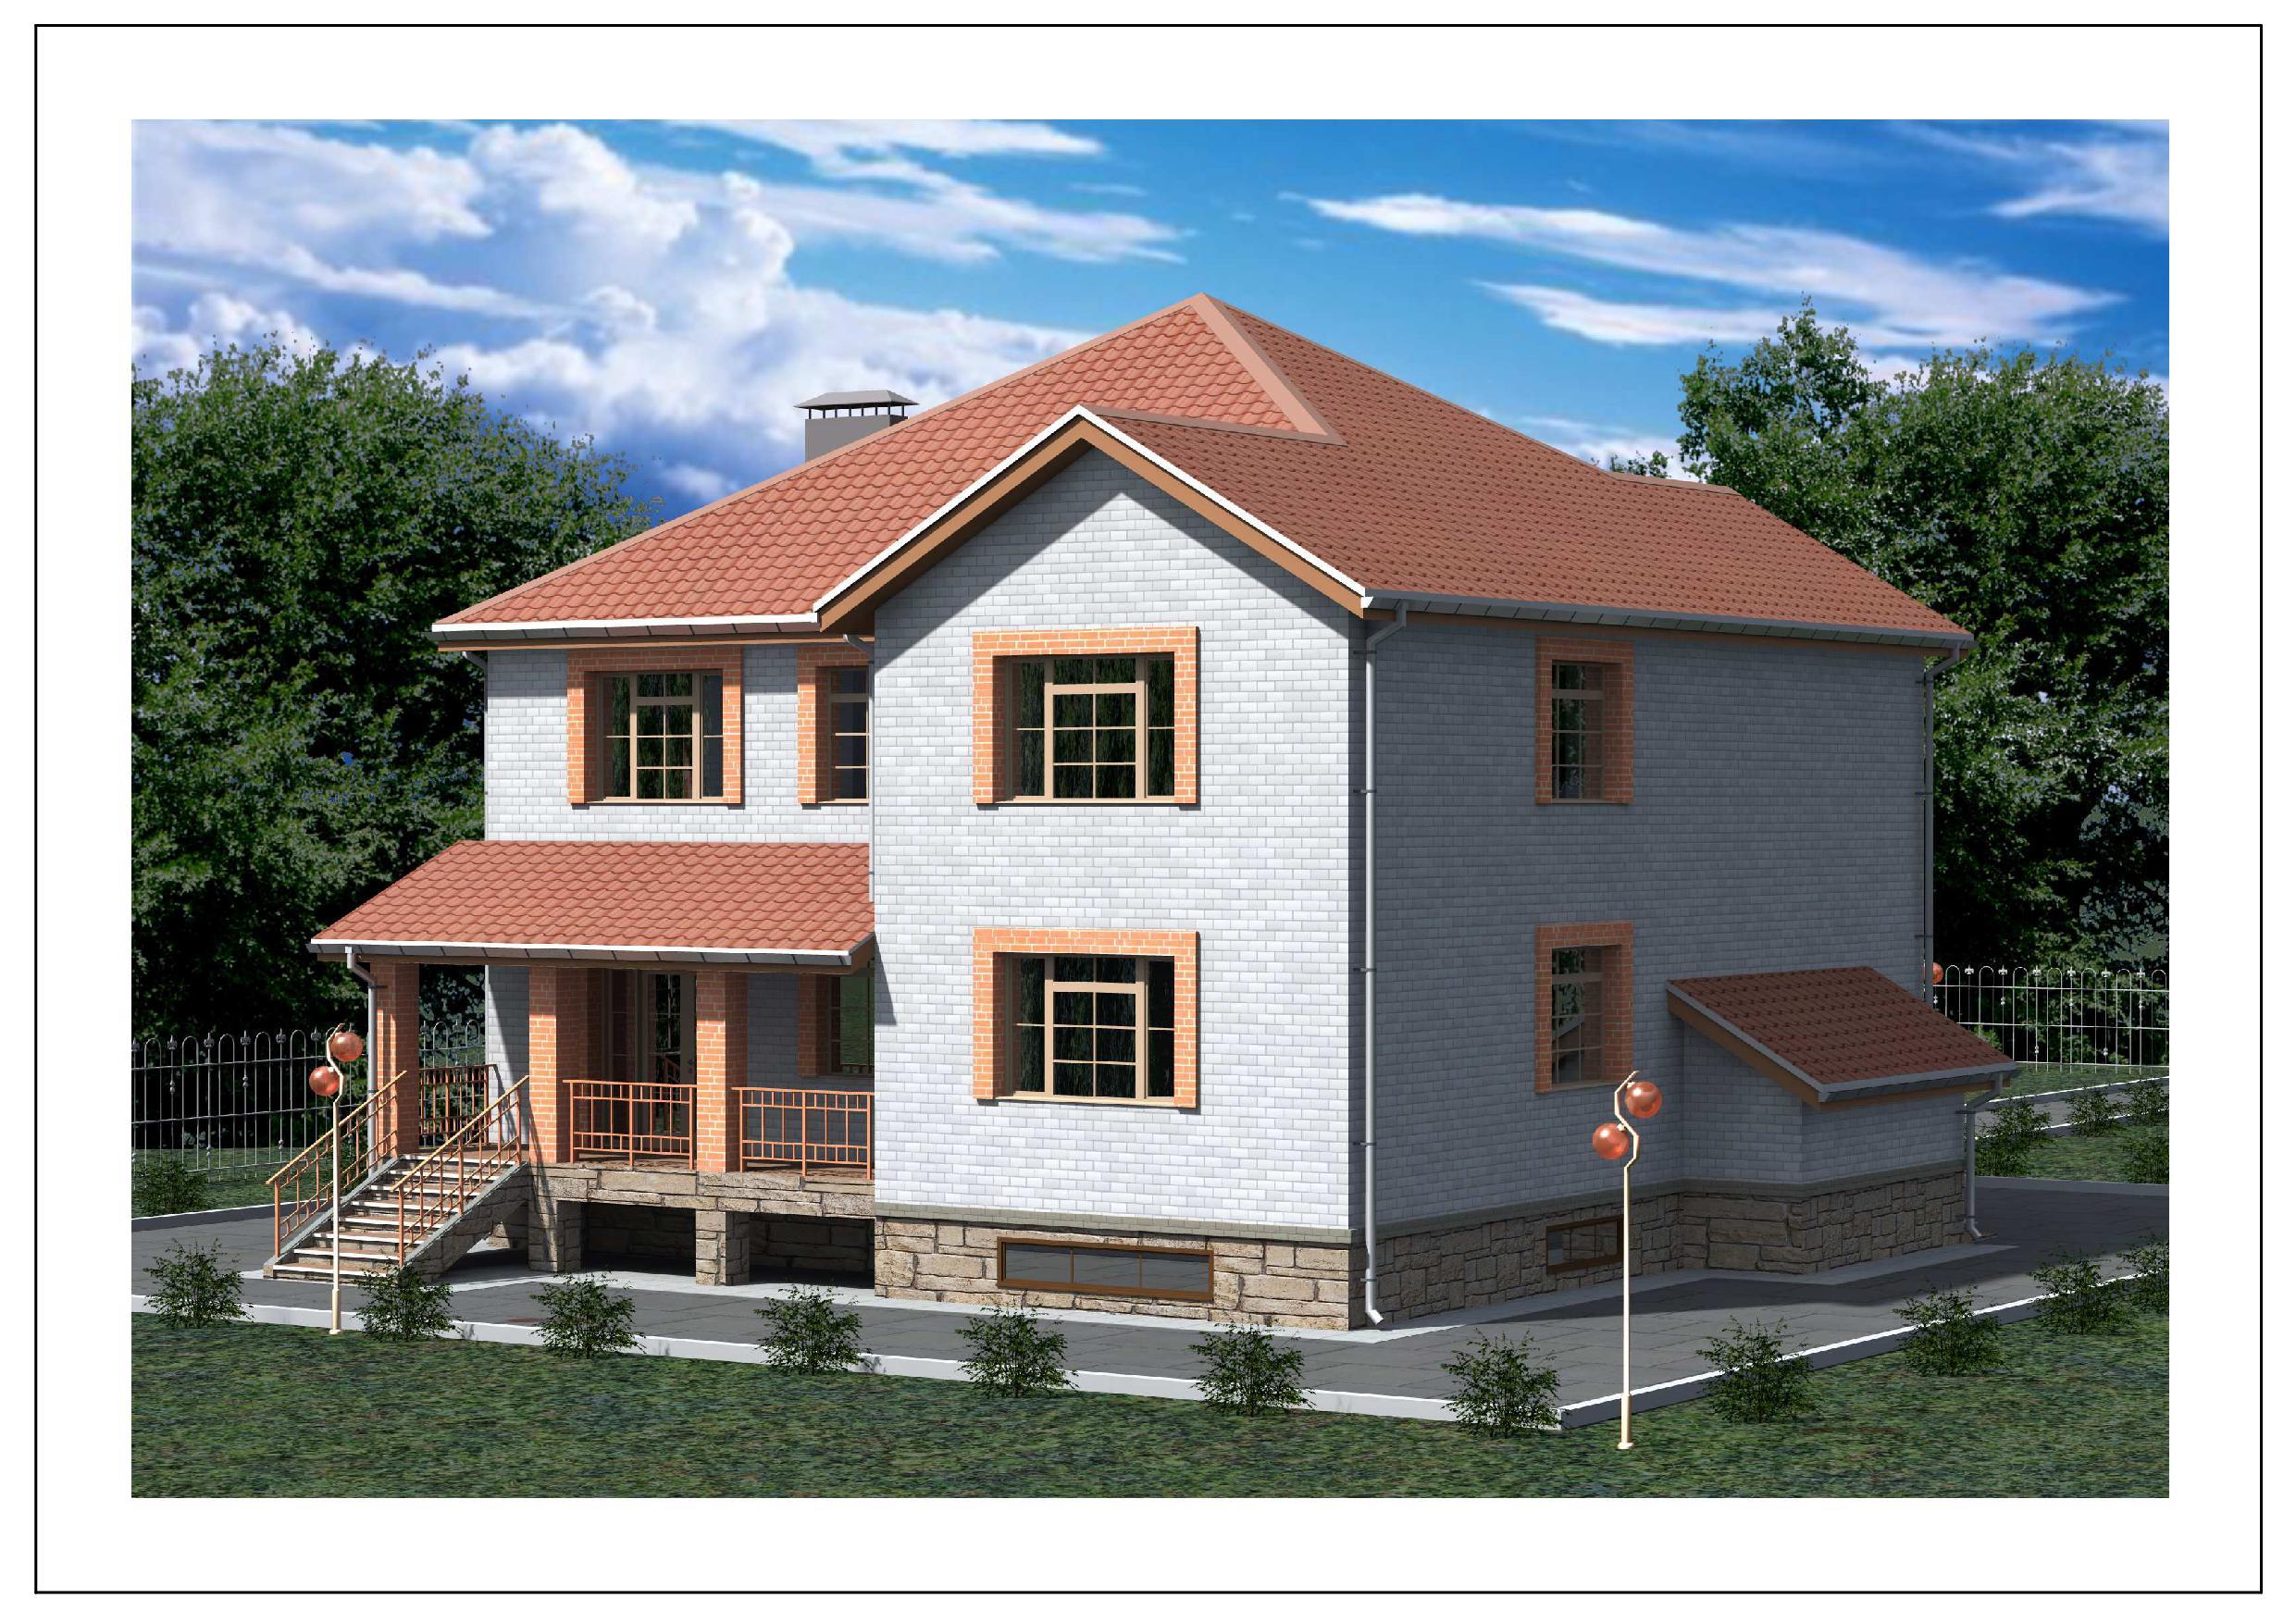 Проект 05.13 фасад